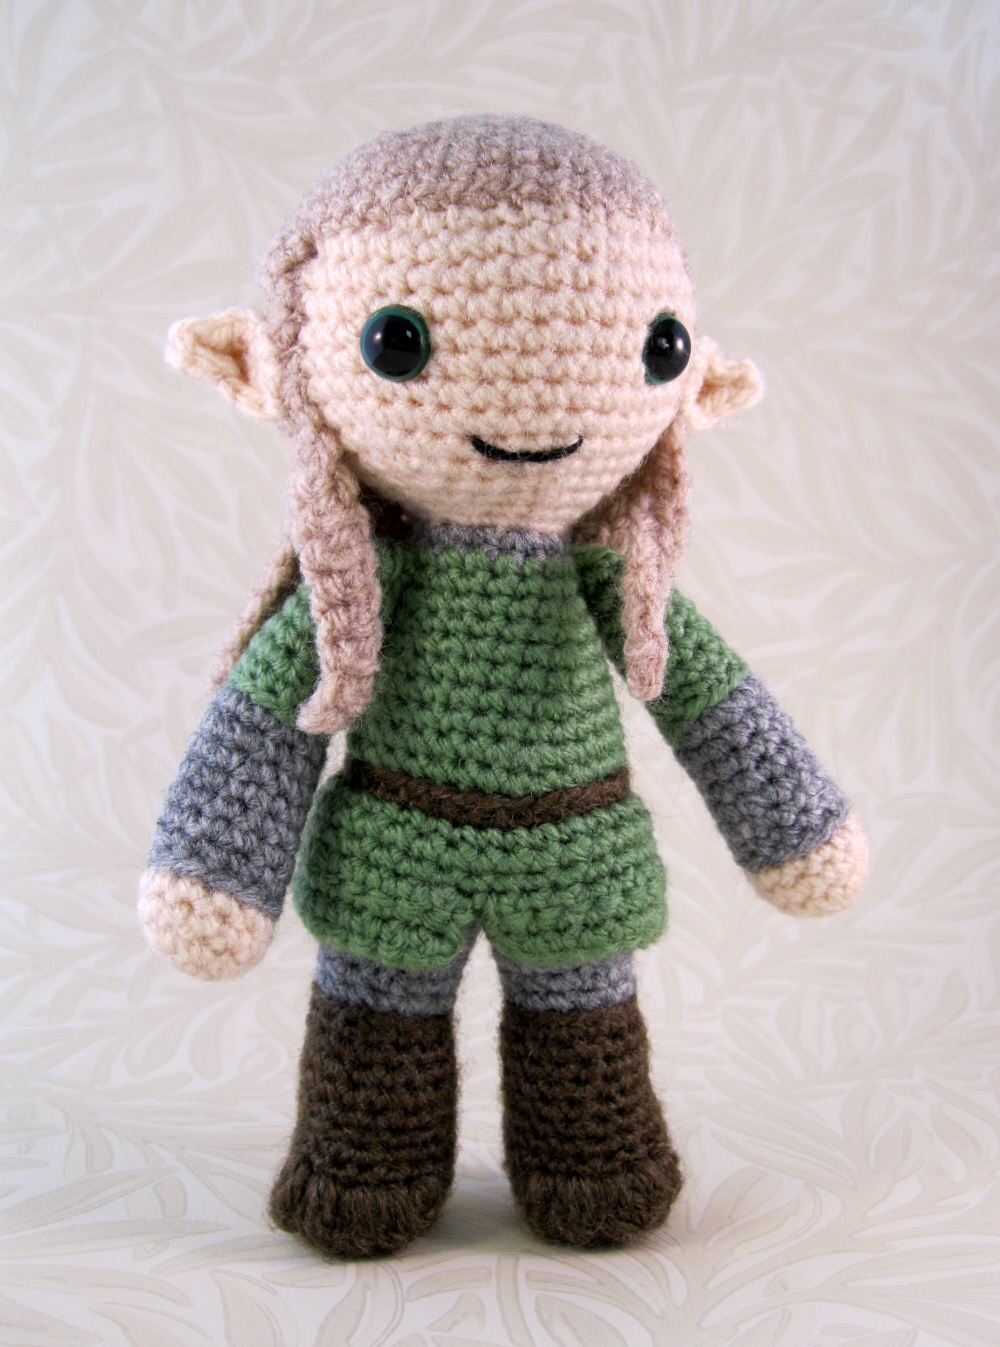 Amigurumi Elf Toy Softies Crochet Free Patterns | Hækling, Hæklet ... | 1347x1000